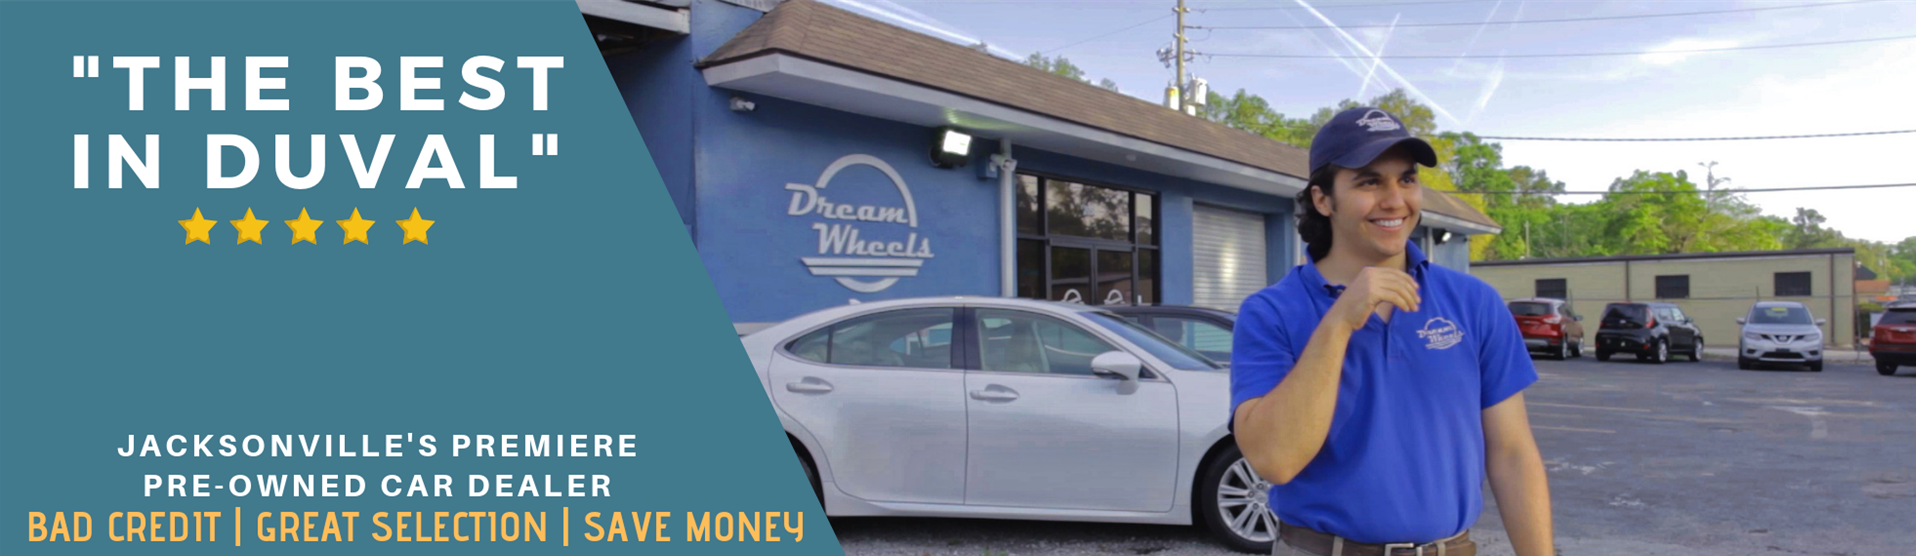 Used Car Dealerships In Jacksonville Fl >> Used Cars Jacksonville Fl Used Cars Trucks Fl Dream Wheels